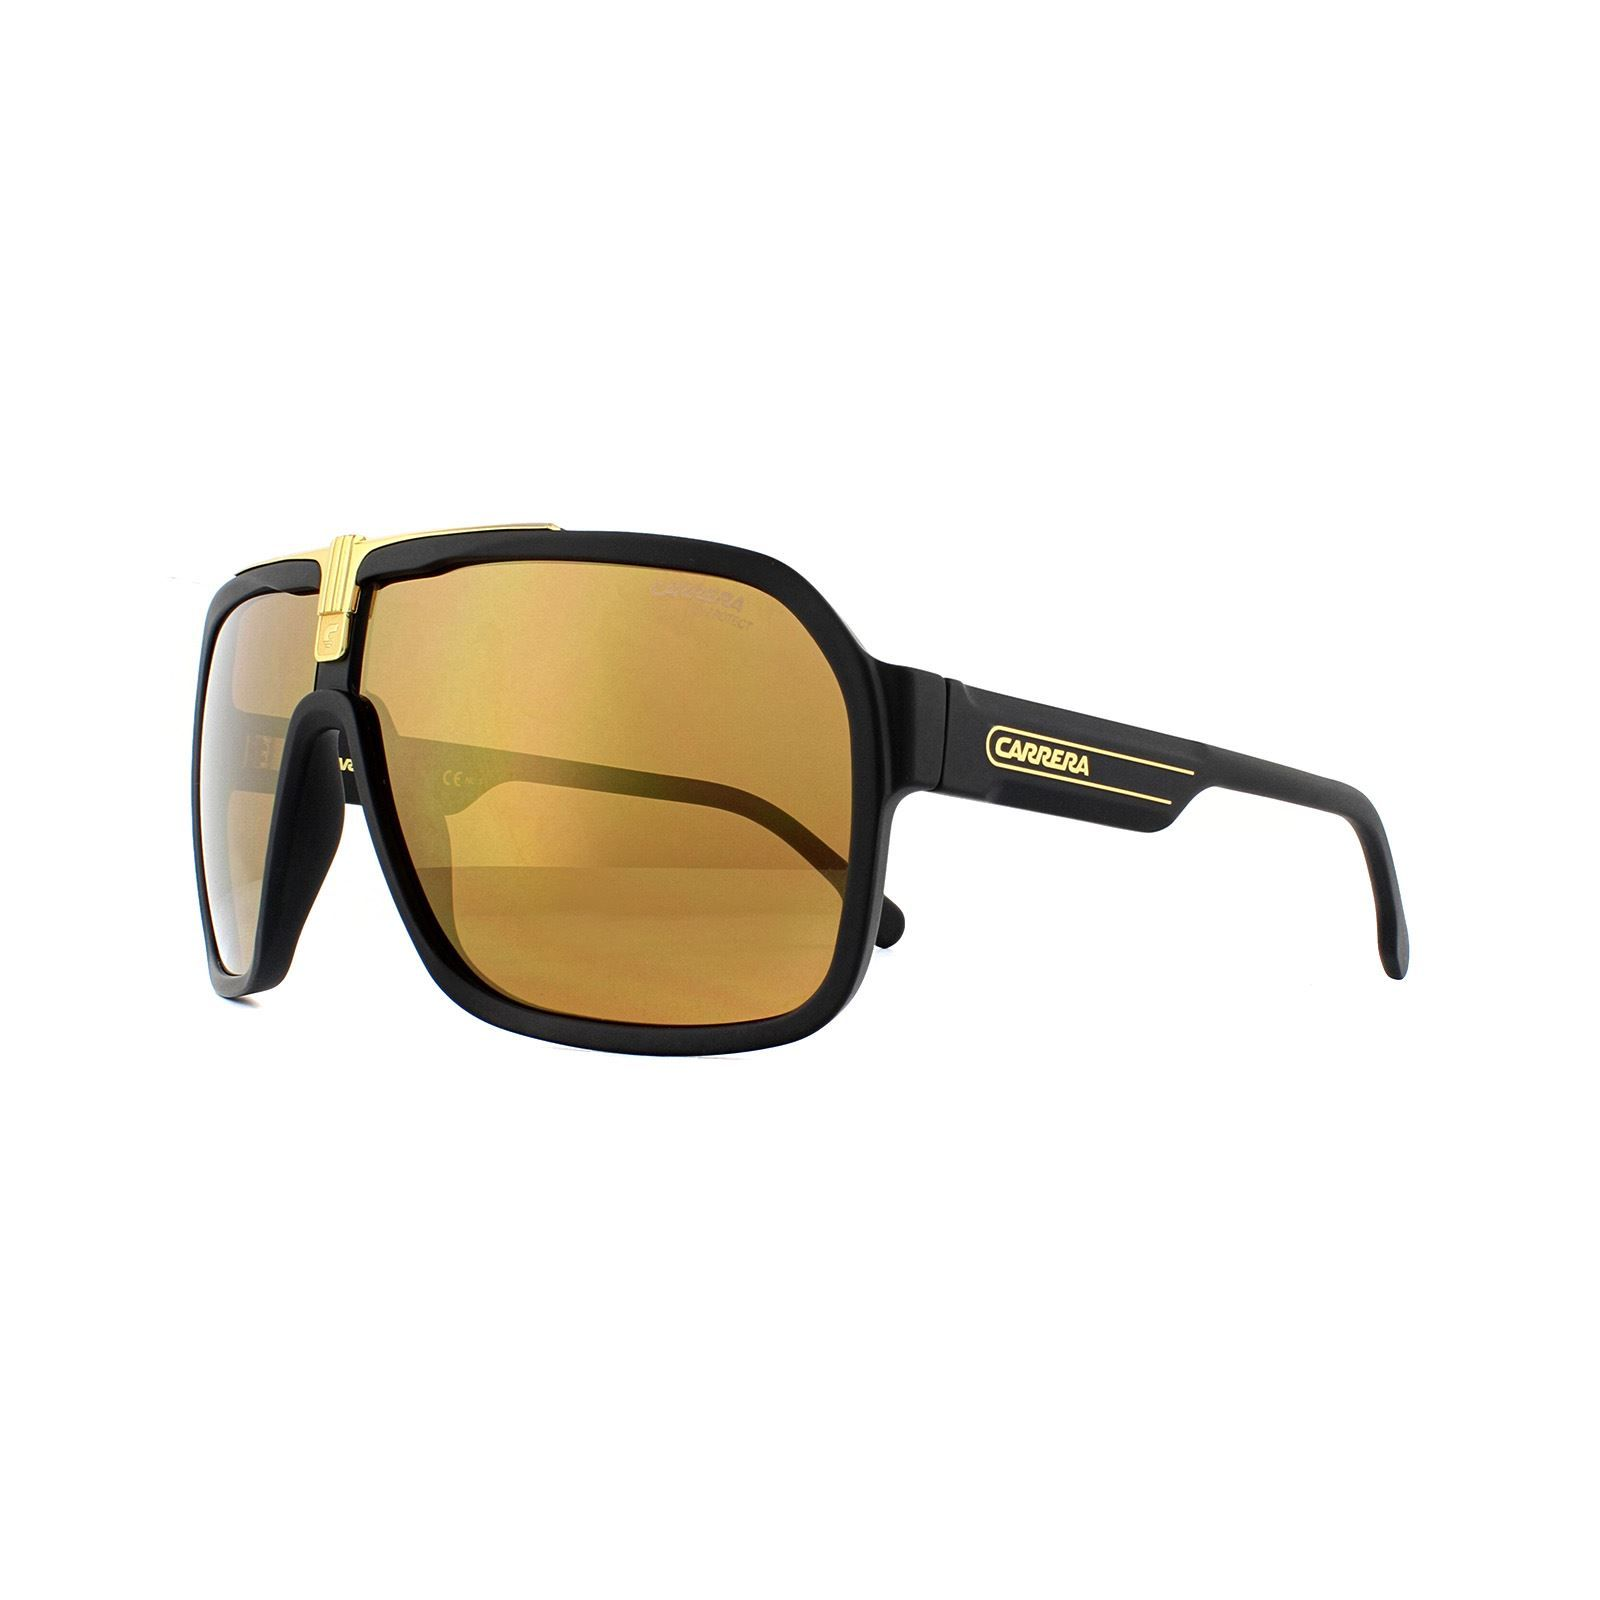 Carrera Sunglasses 1014/S I46 K1 Black Gold Gold Mirror